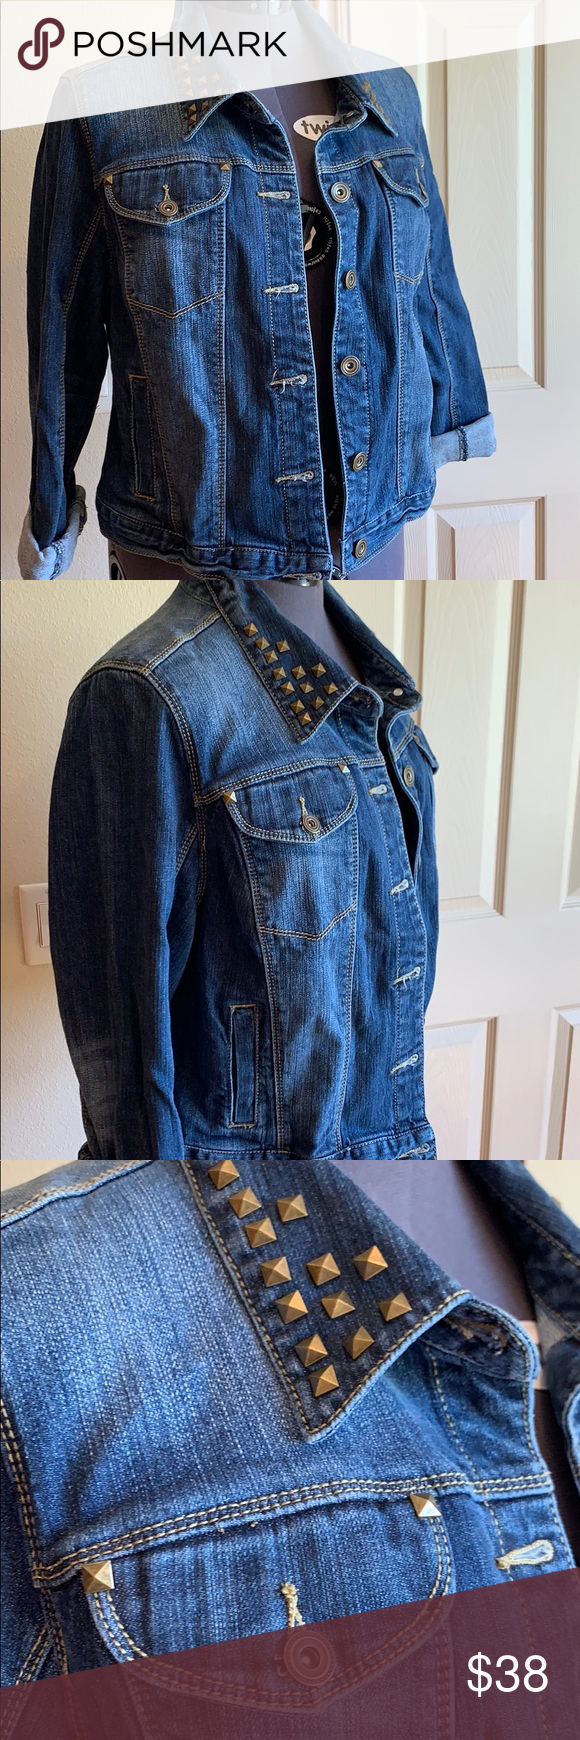 Lane Bryant 14 Denim Jacket Clothes Design Denim Jacket Fashion [ 1740 x 580 Pixel ]